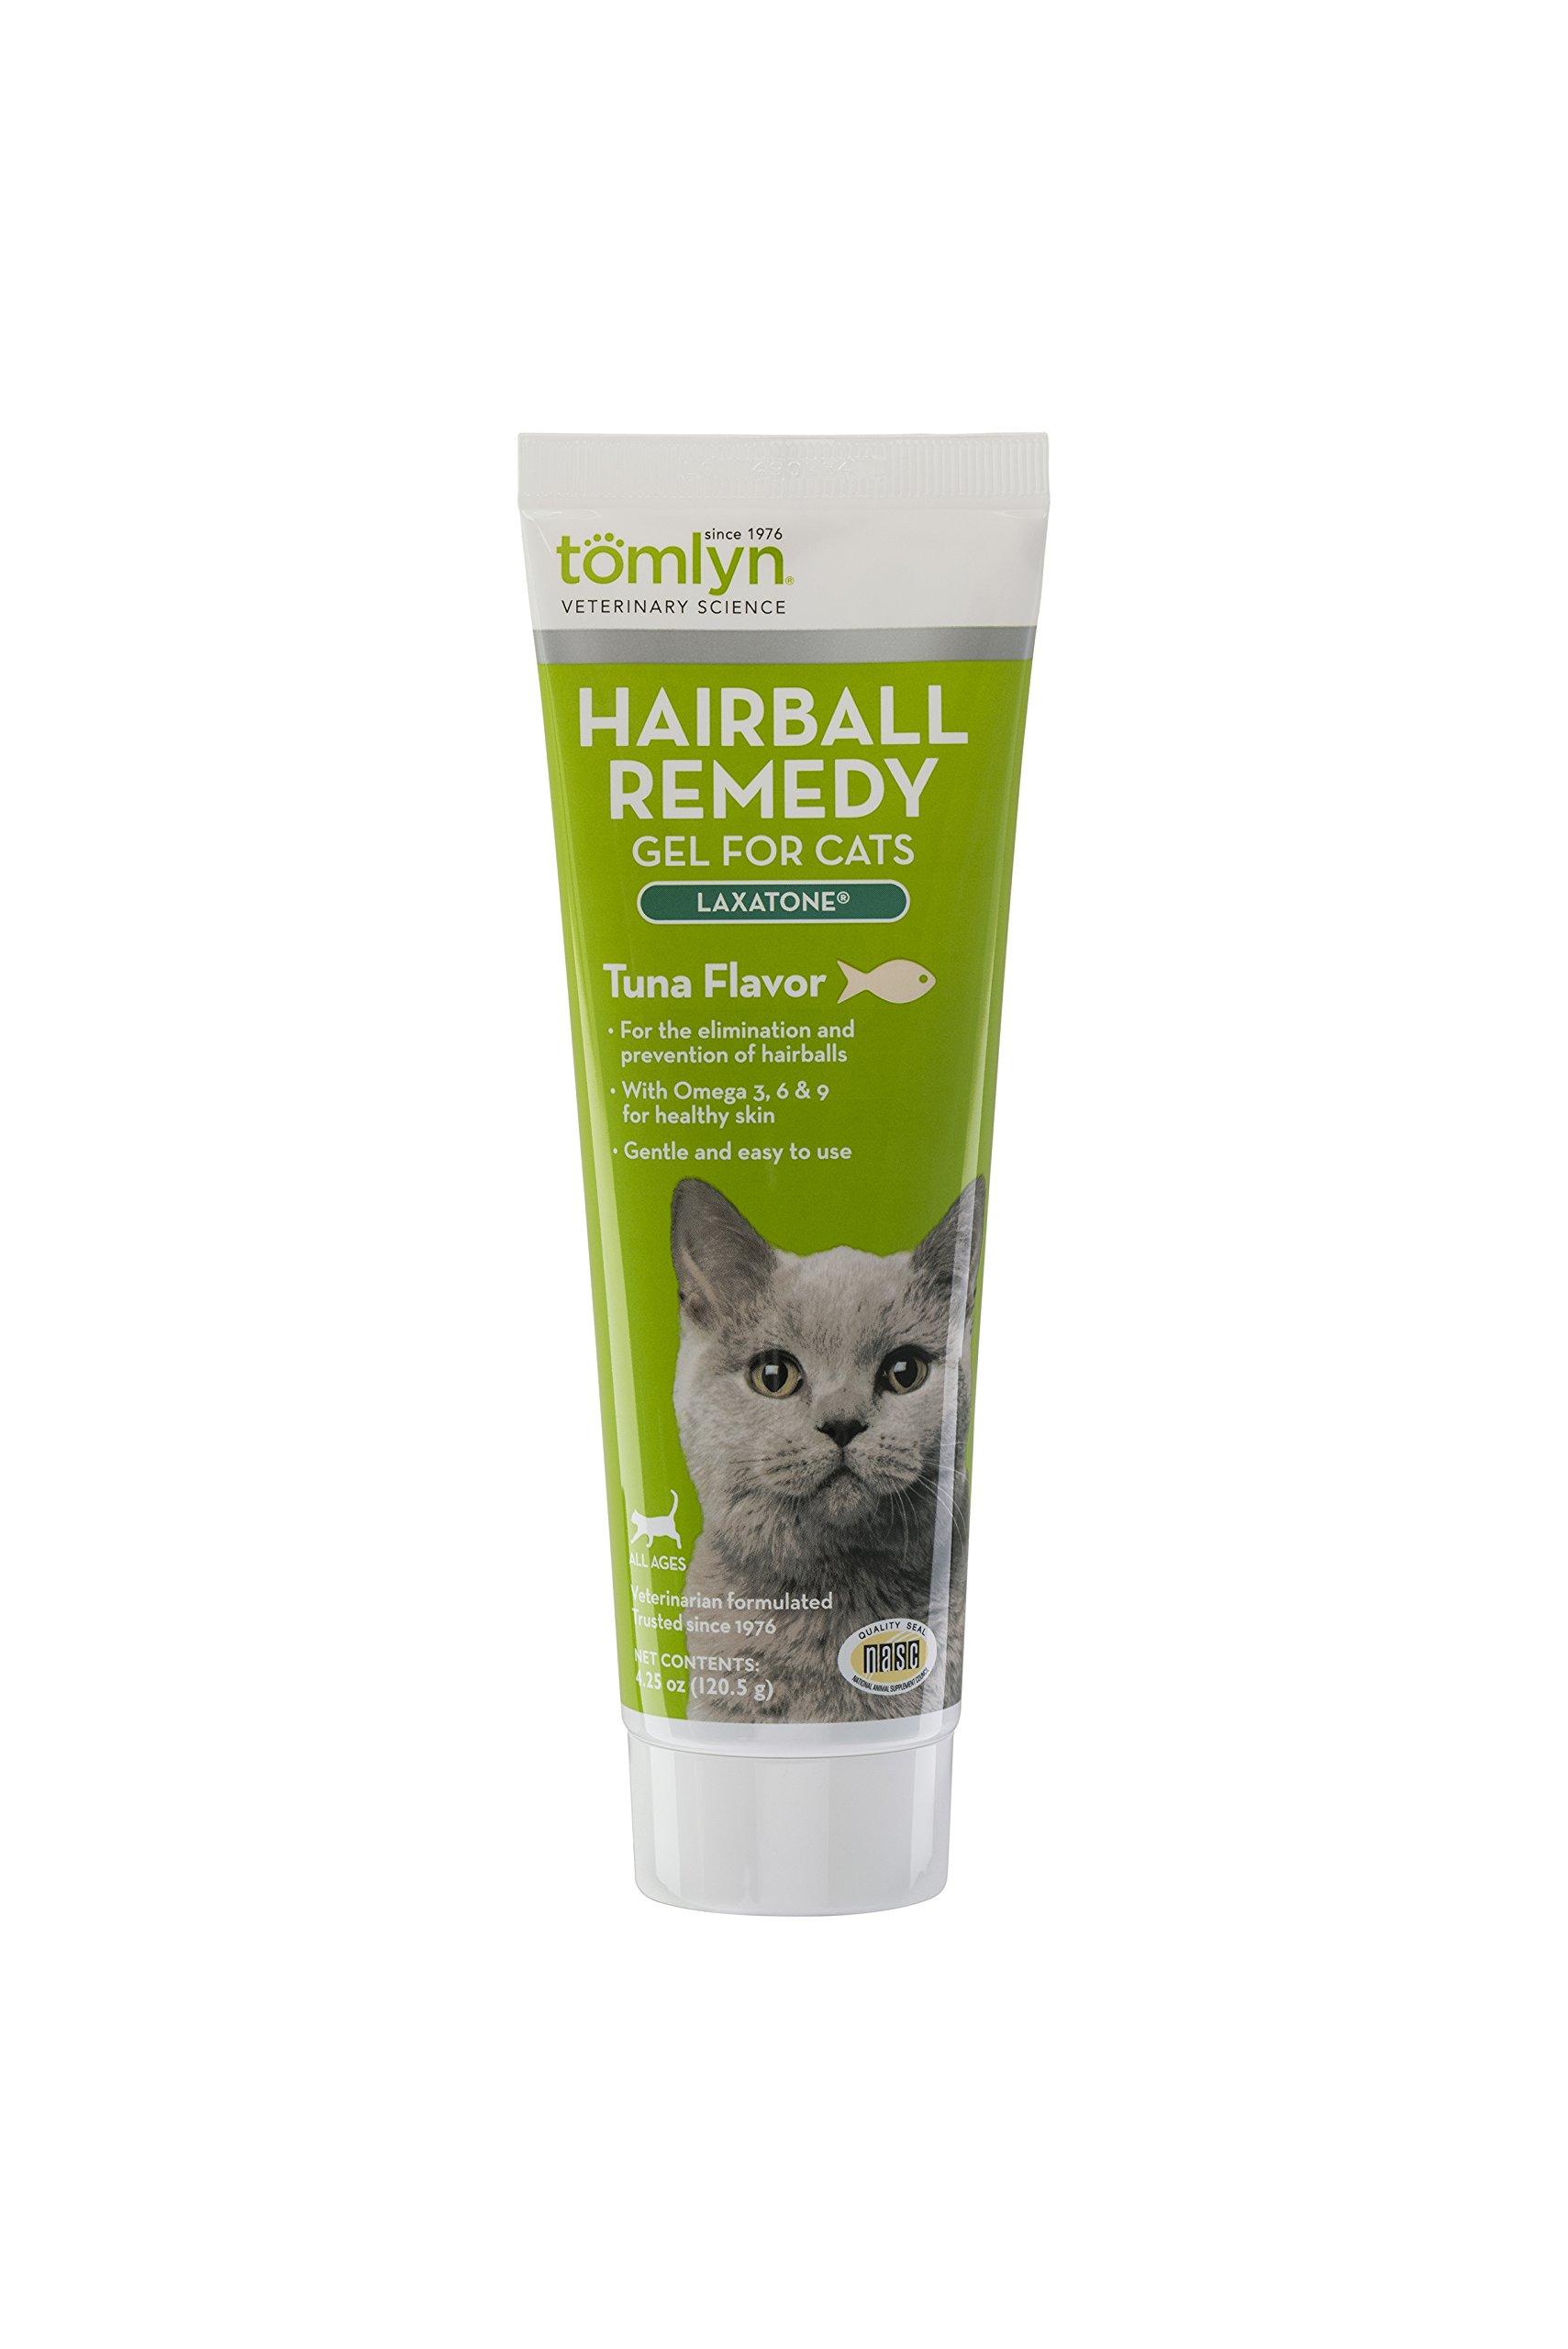 Tomlyn Hairball Remedy Gel for Cats, Tuna Flavor, (Laxatone) 4.25 oz